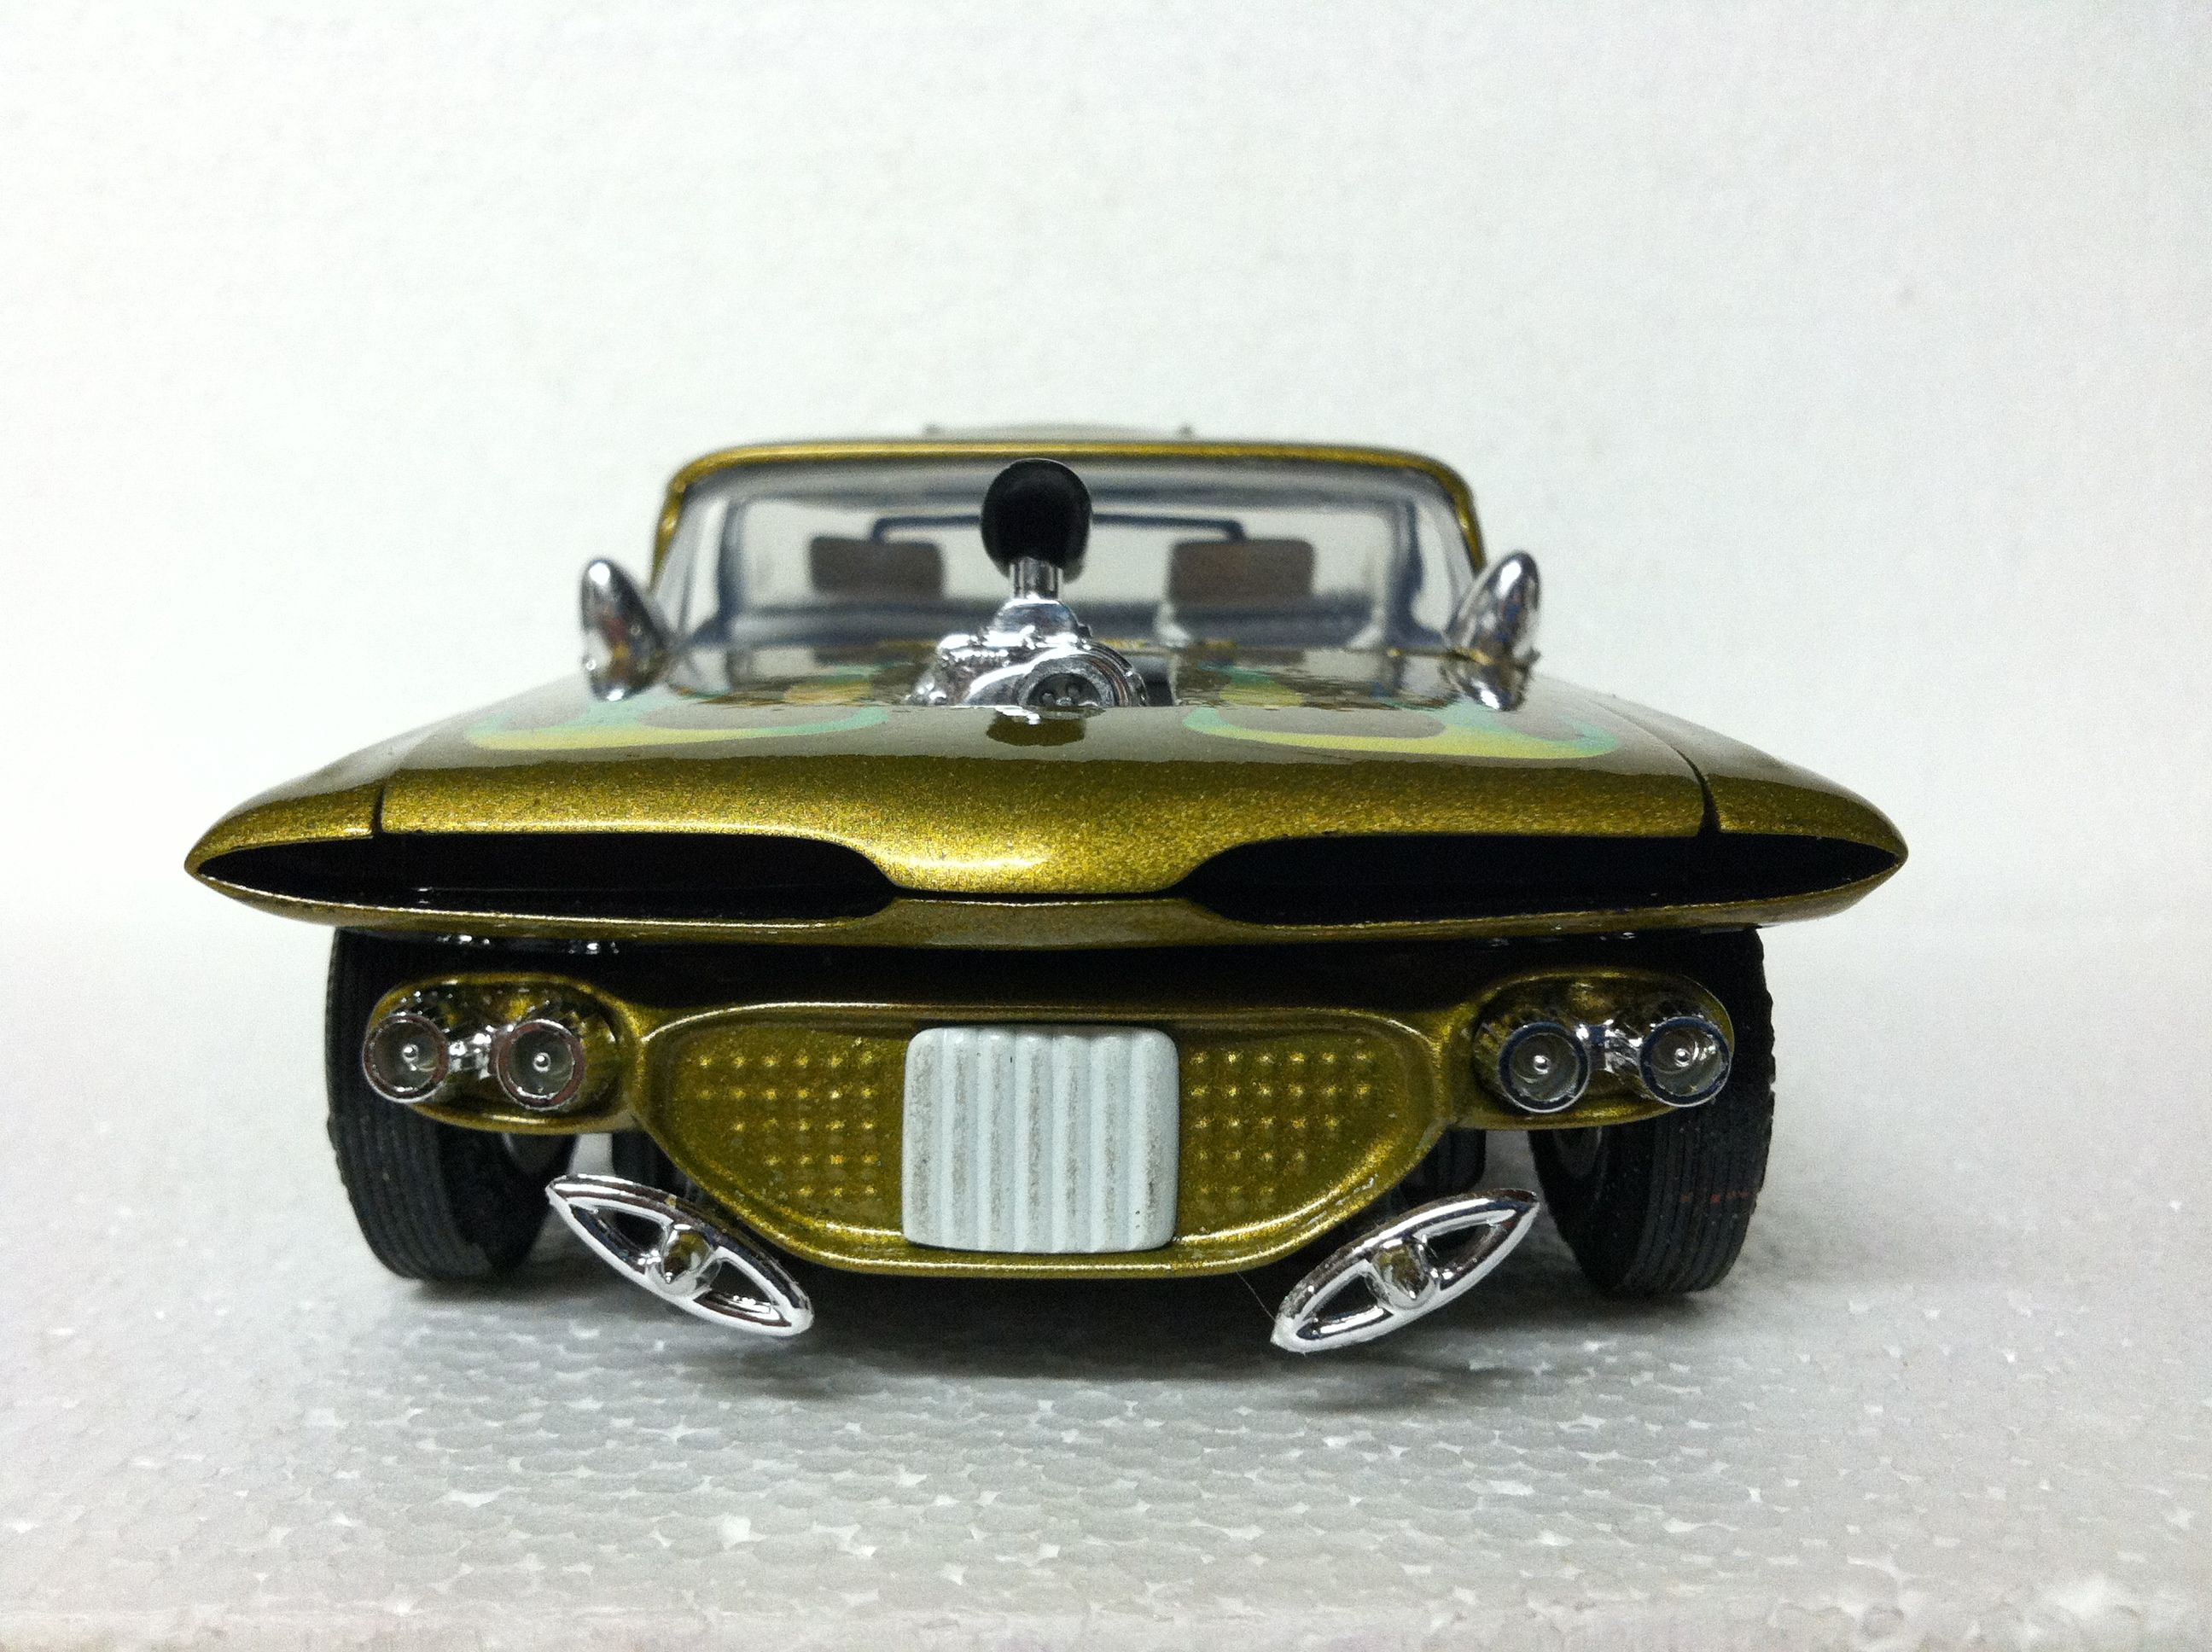 59 Chevy El Camino Radical Custom Car Model Model Cars Kits